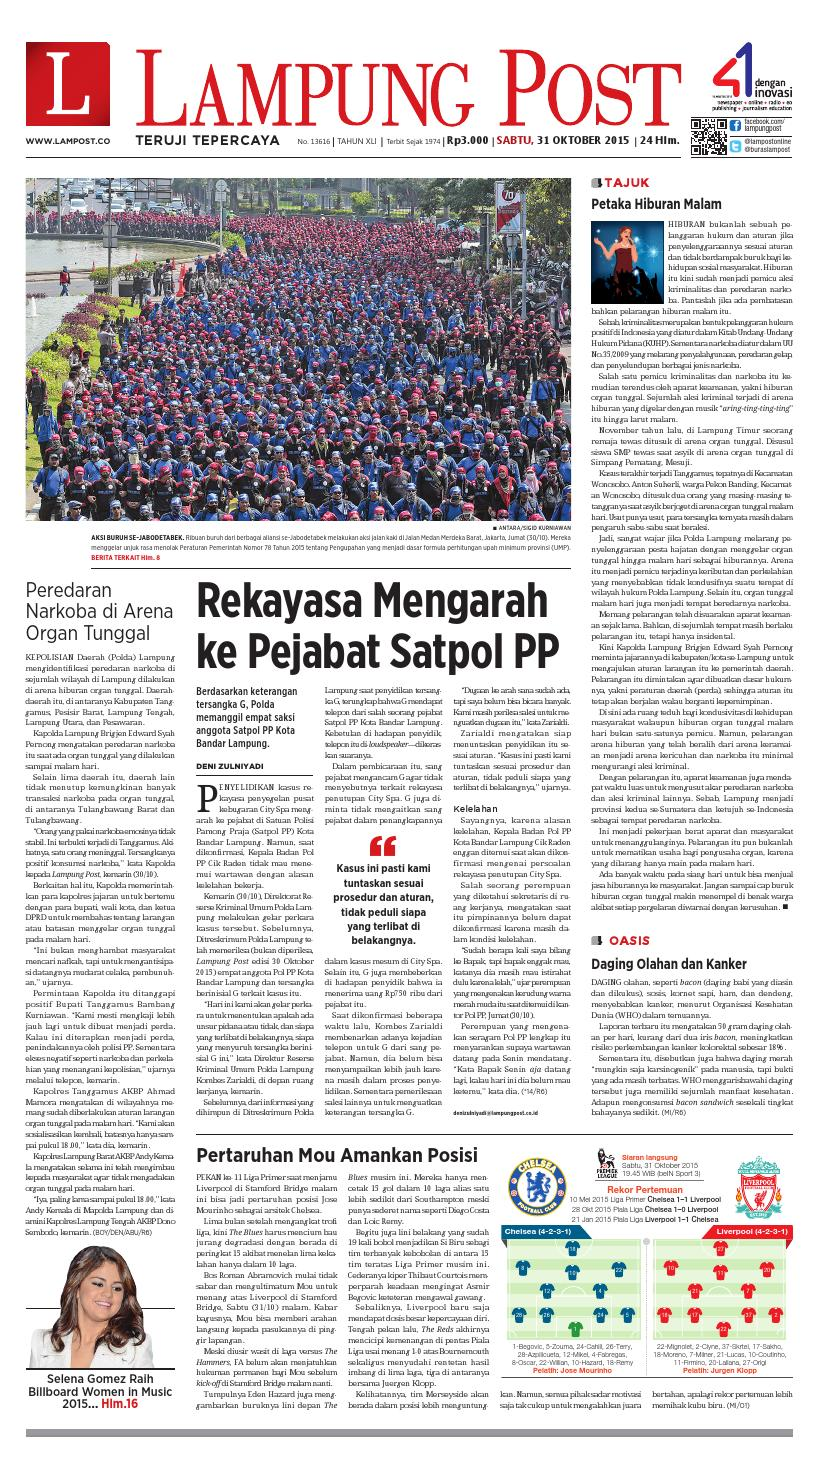 Lampung Post Sabtu 31 Oktober 2015 By Issuu Poduk Ukm Bumn Mr Kerbaw Keripik Bawang Bayam